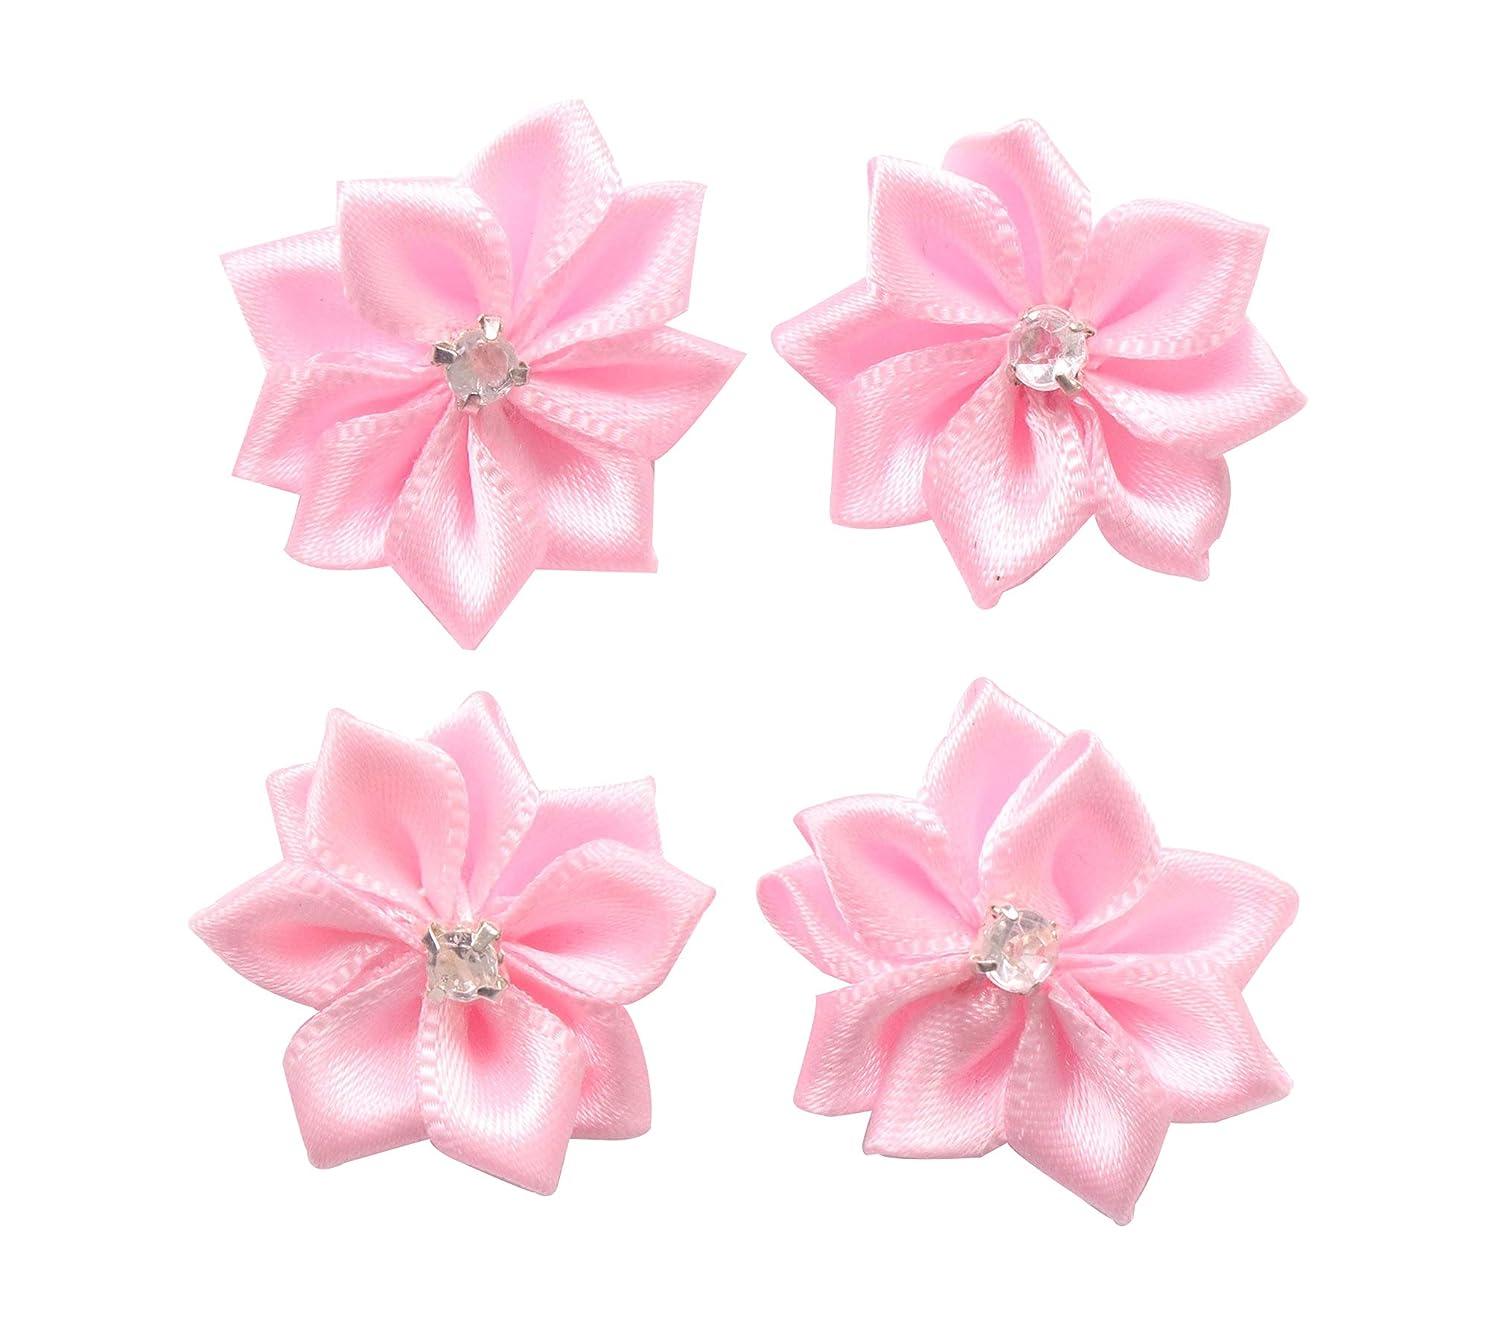 YAKA 60pcs Pink Satin Ribbon Flowers Bows Rose w/Rhinestone Appliques Craft Wedding Ornament 1.1inch